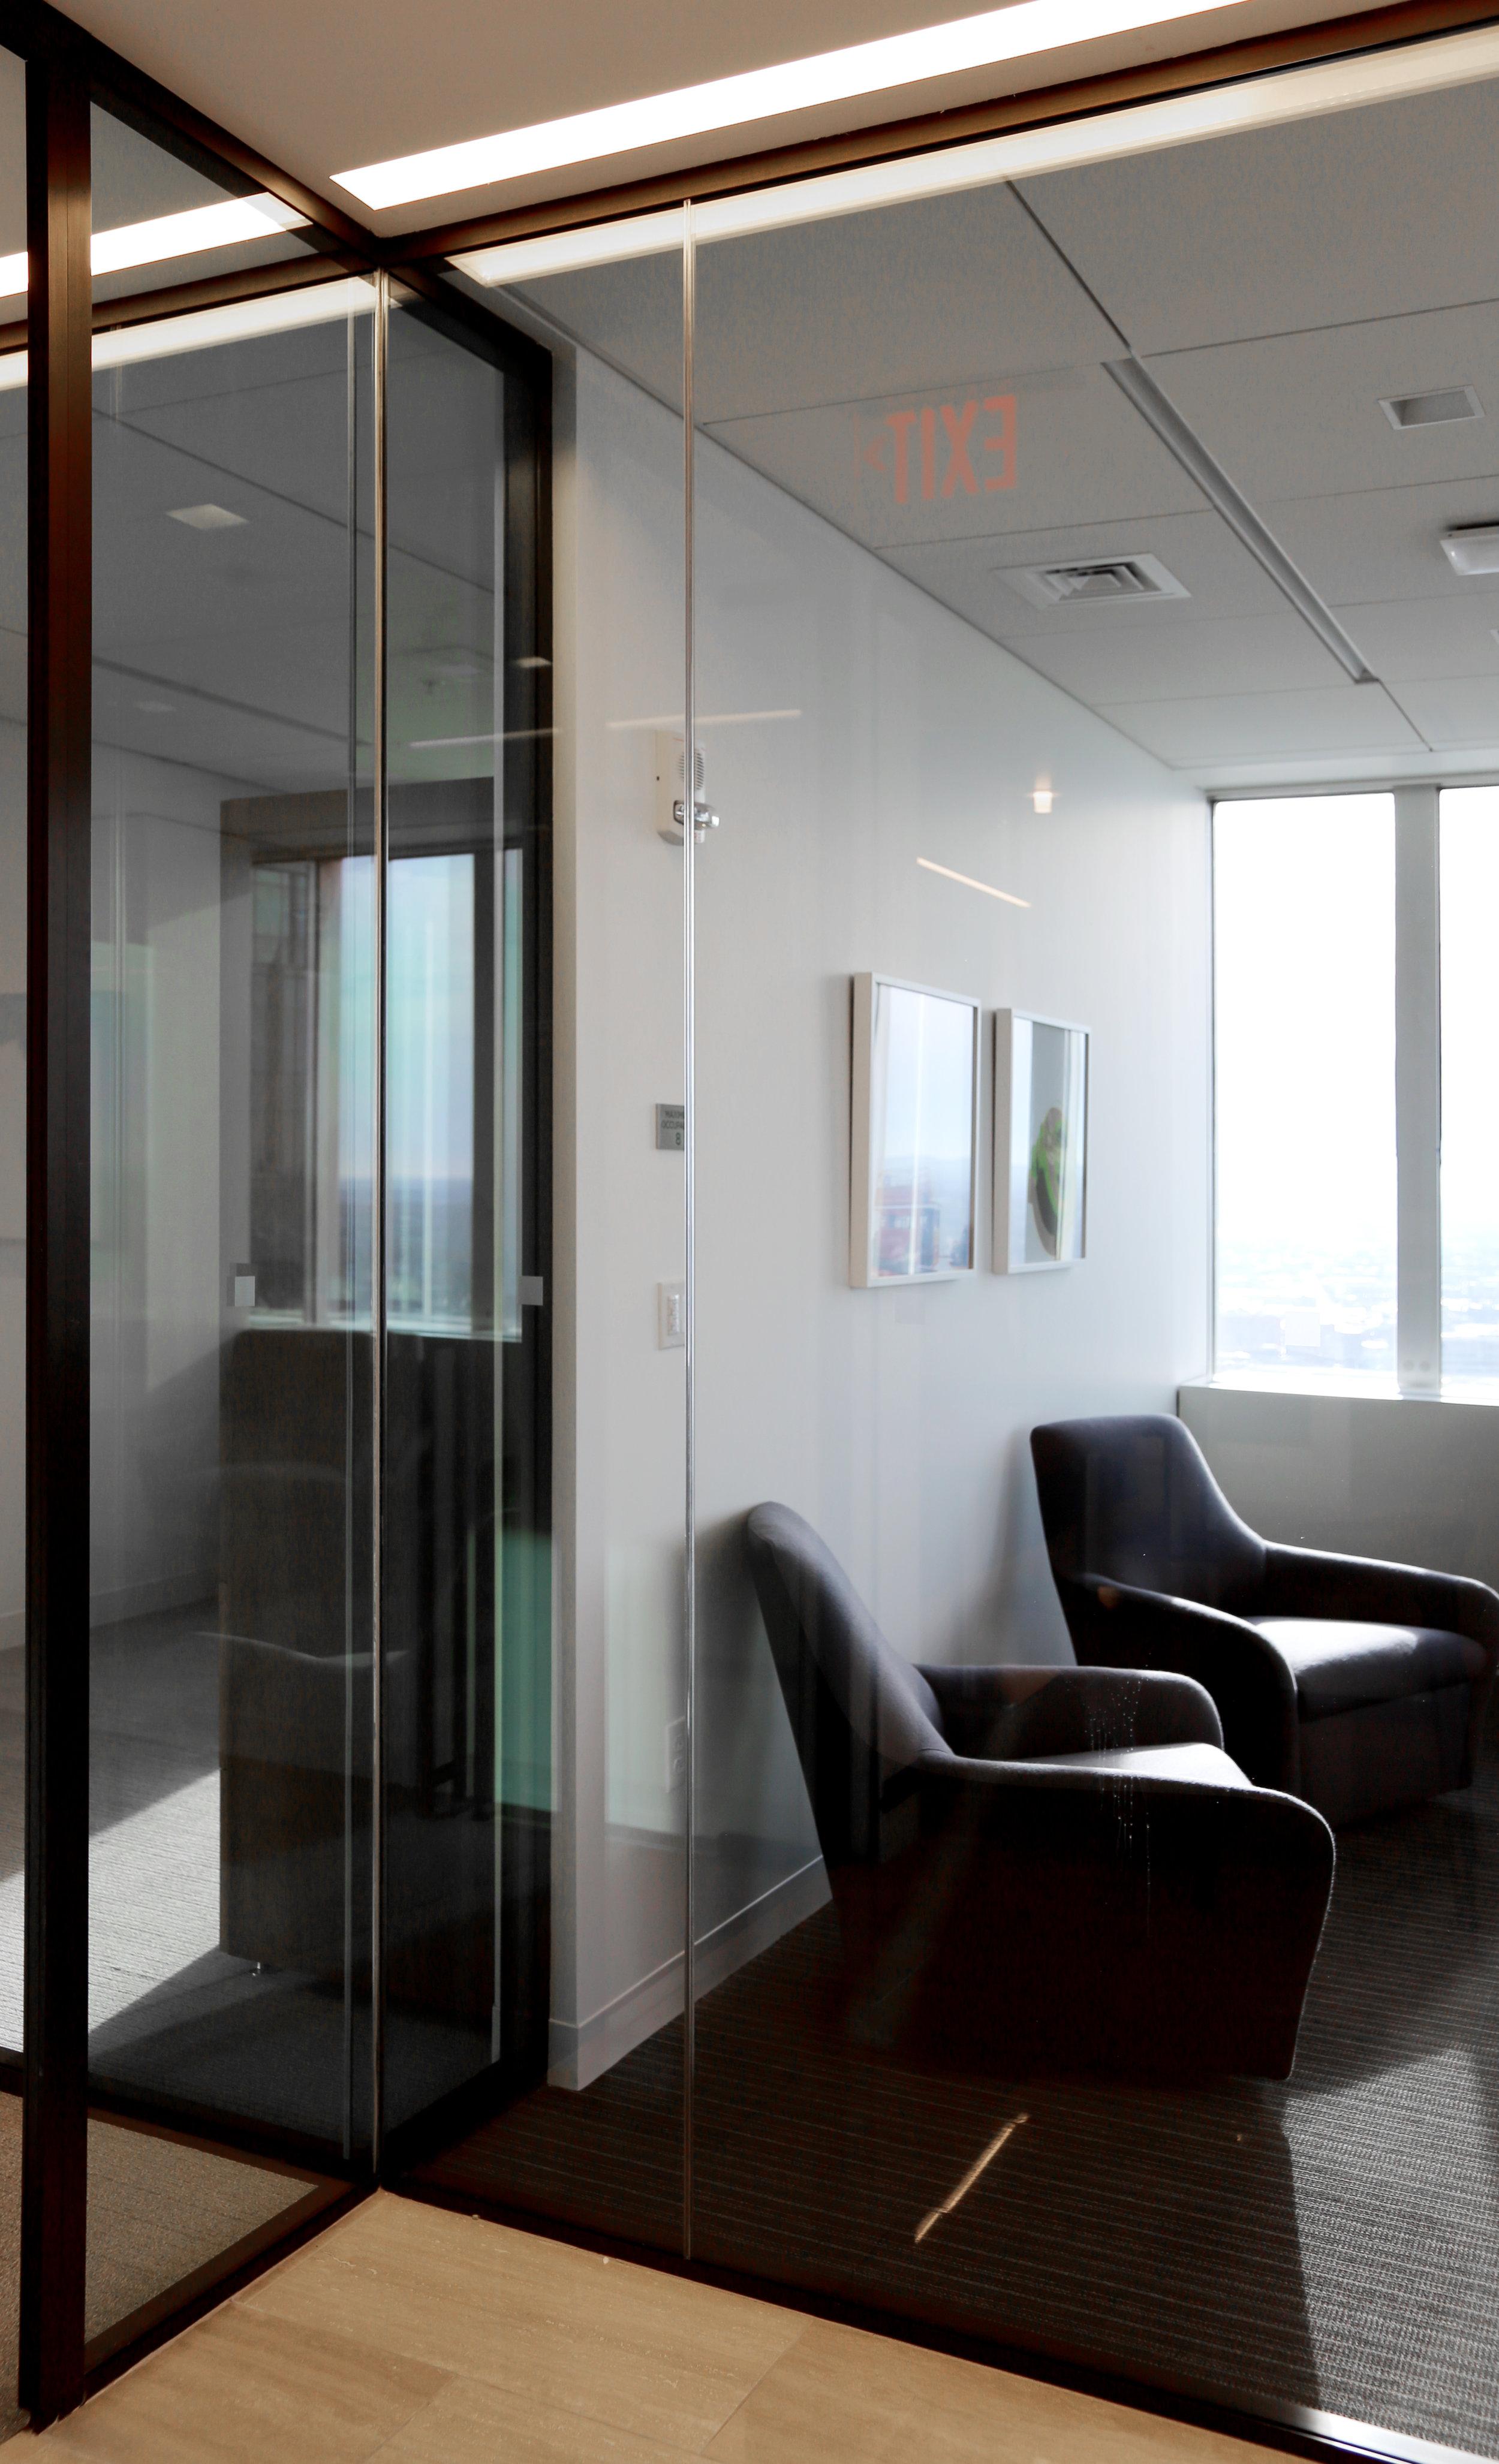 Modernus Aluminum Framed Glass Corner Condition - Spaceworks AI.jpg